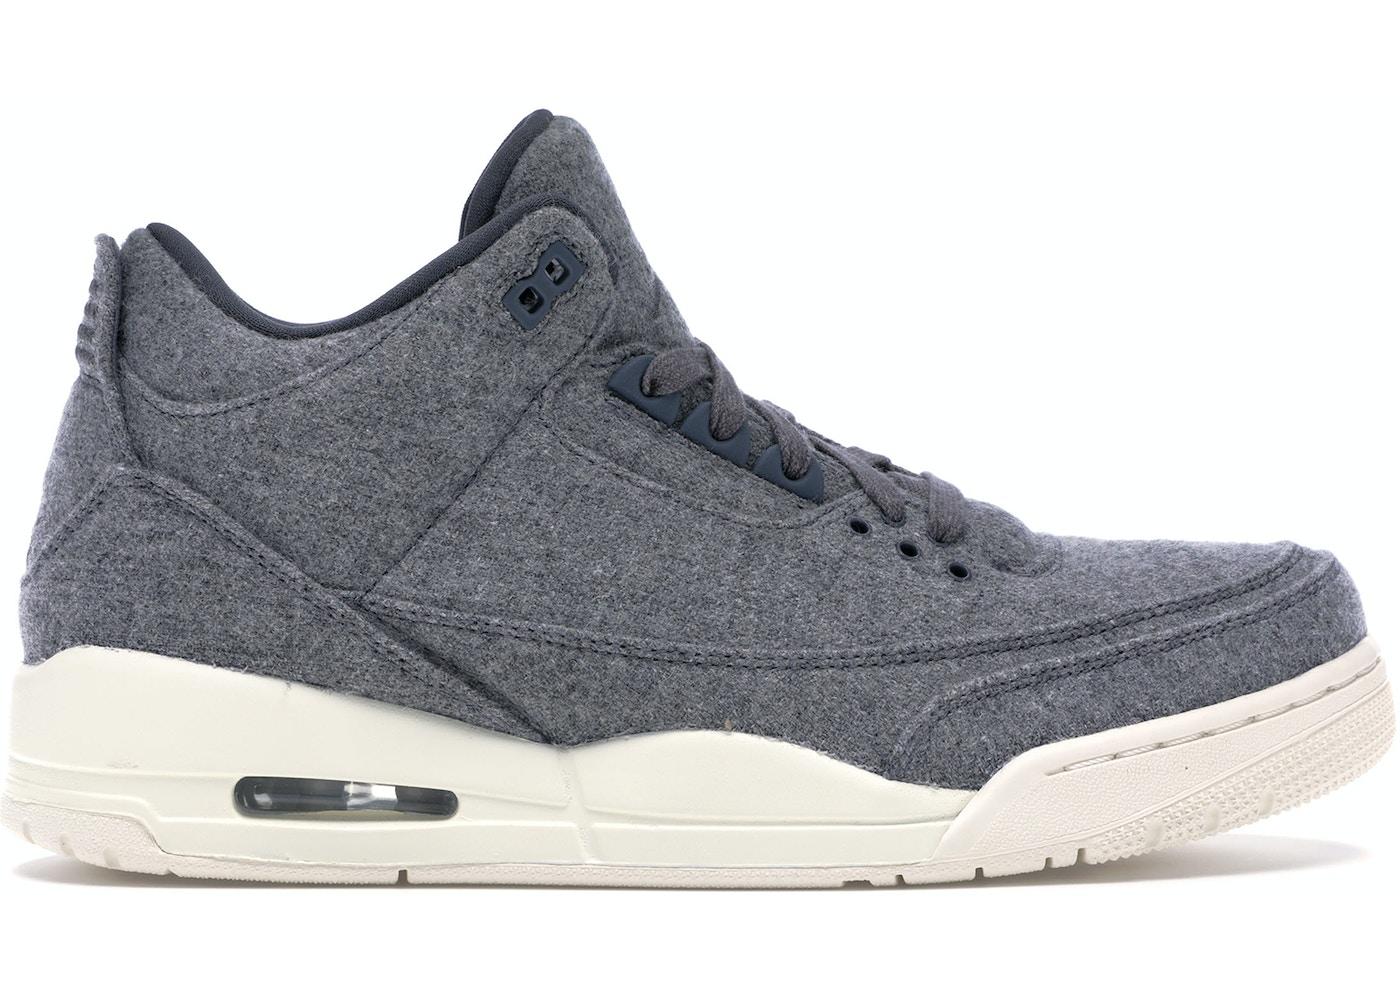 1e85b0dc934 Jordan 3 Retro Wool - 854263-004